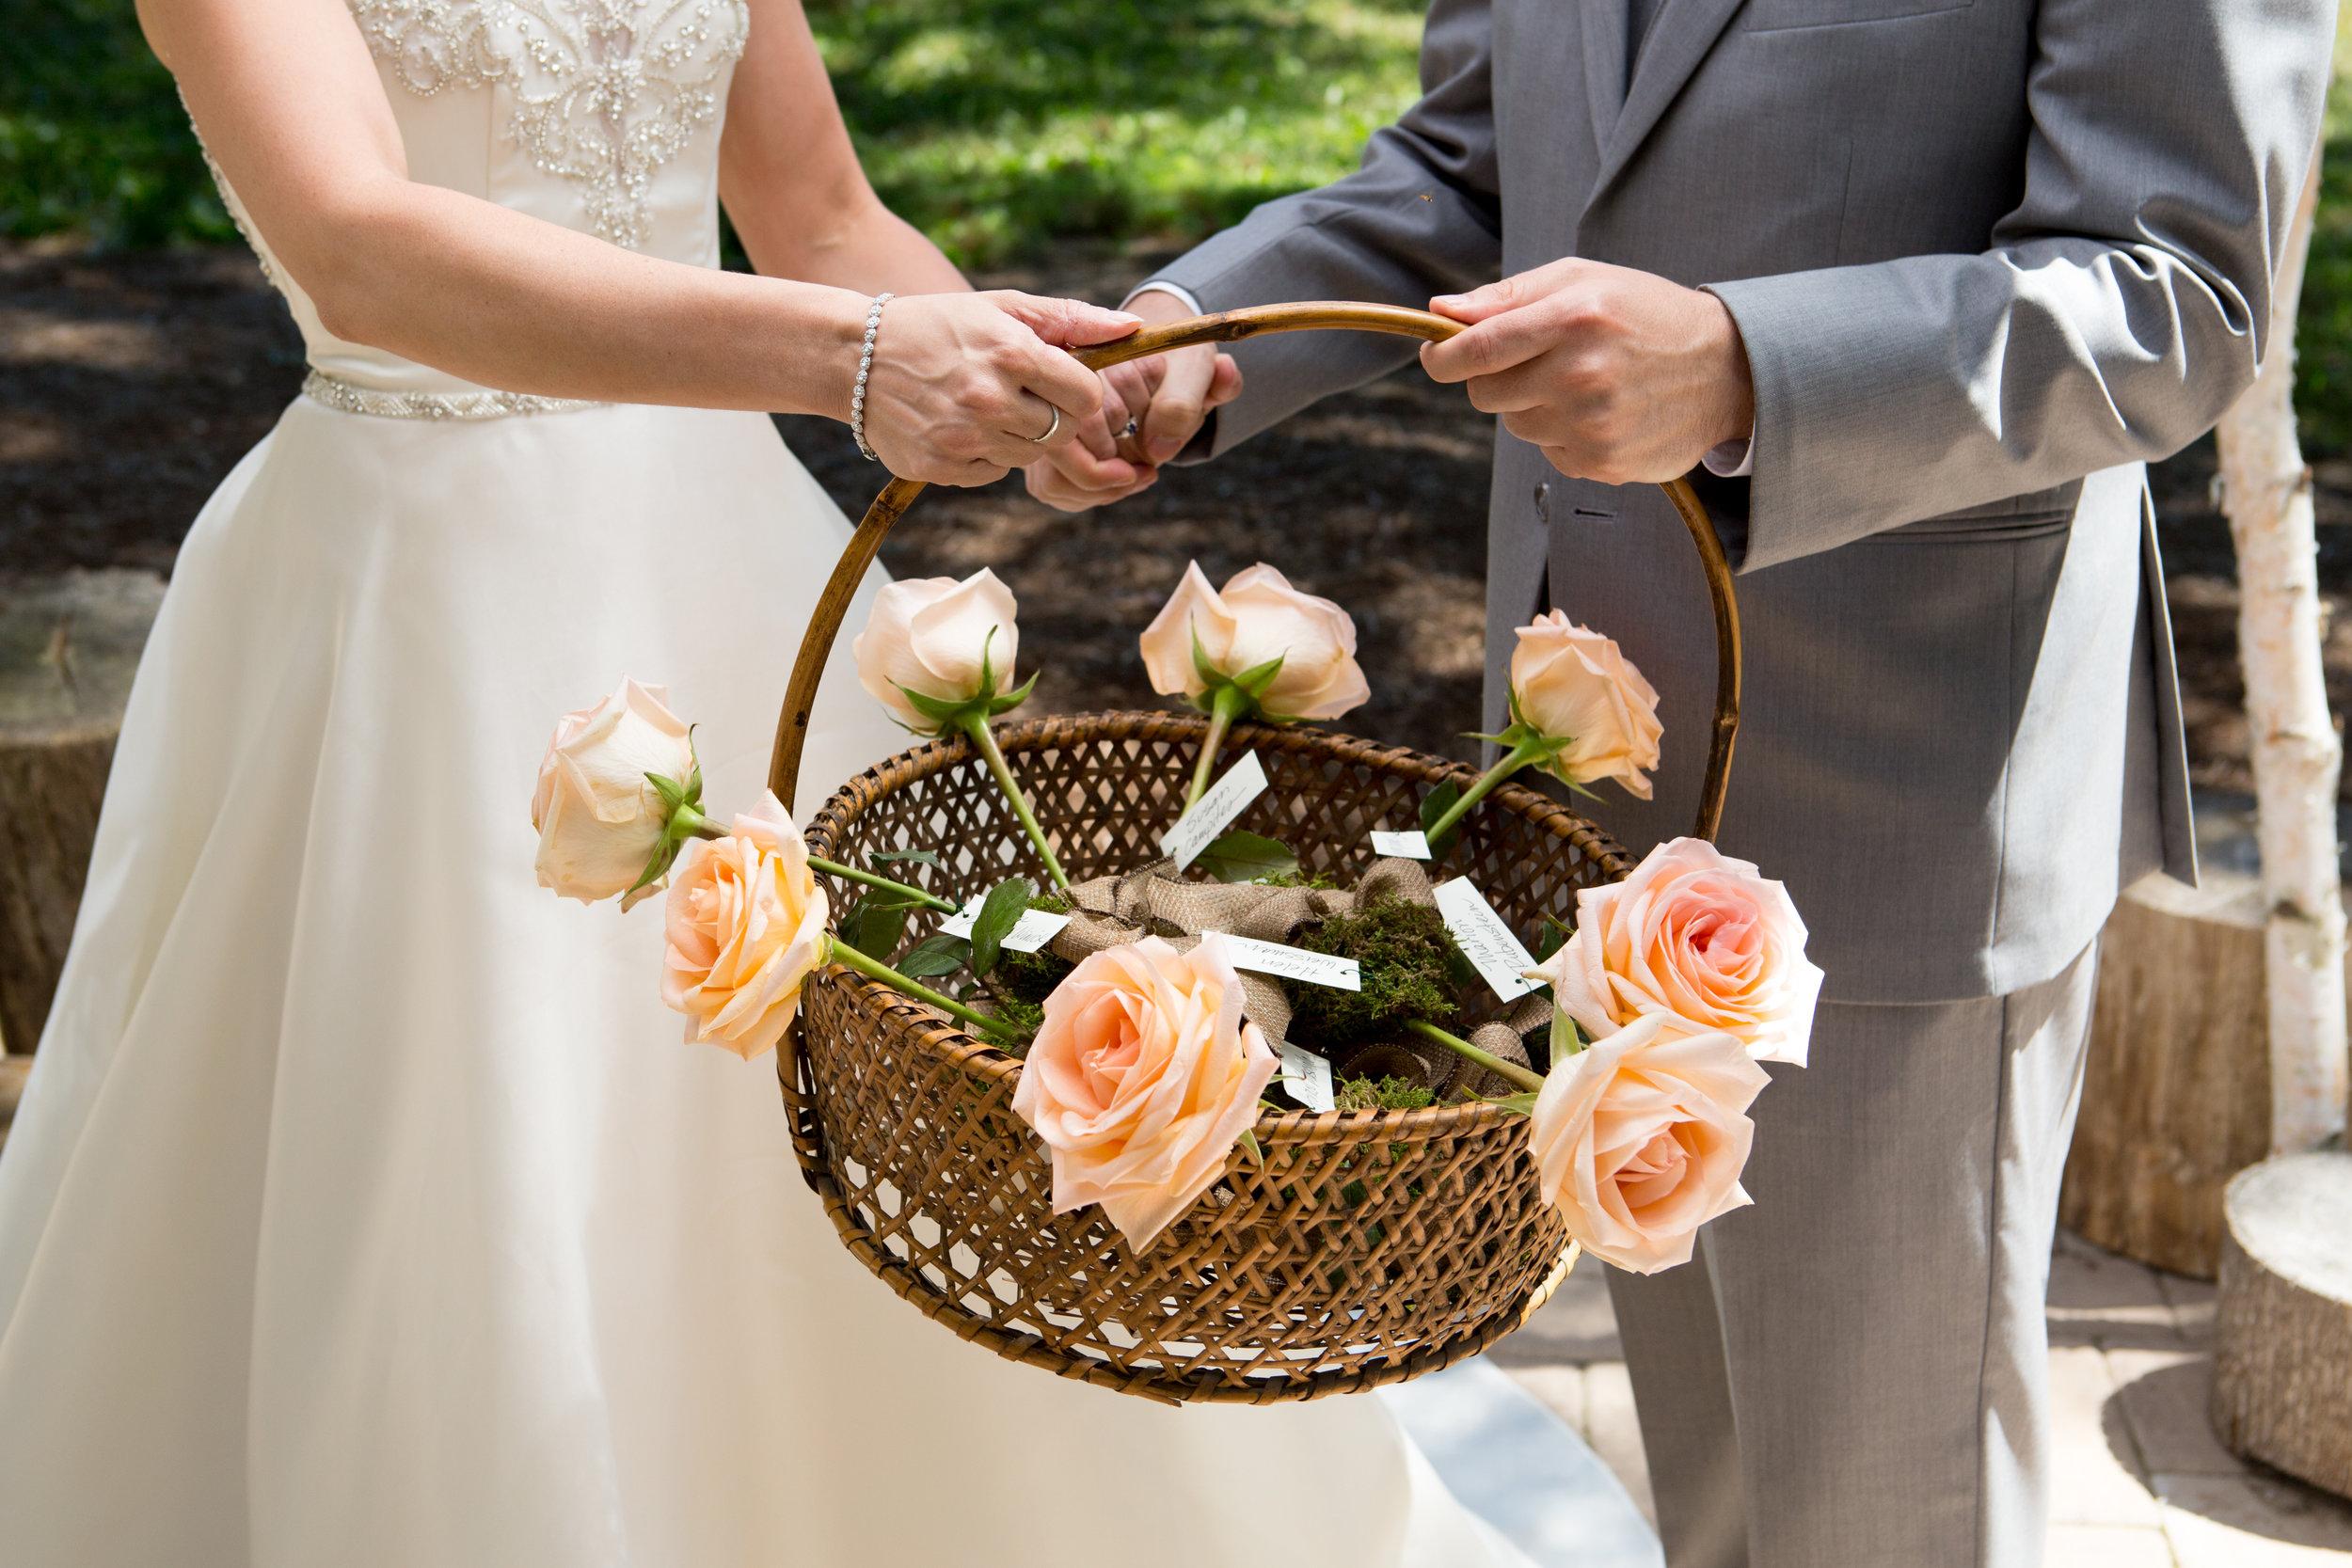 ca_080517_wedding_0077.jpg